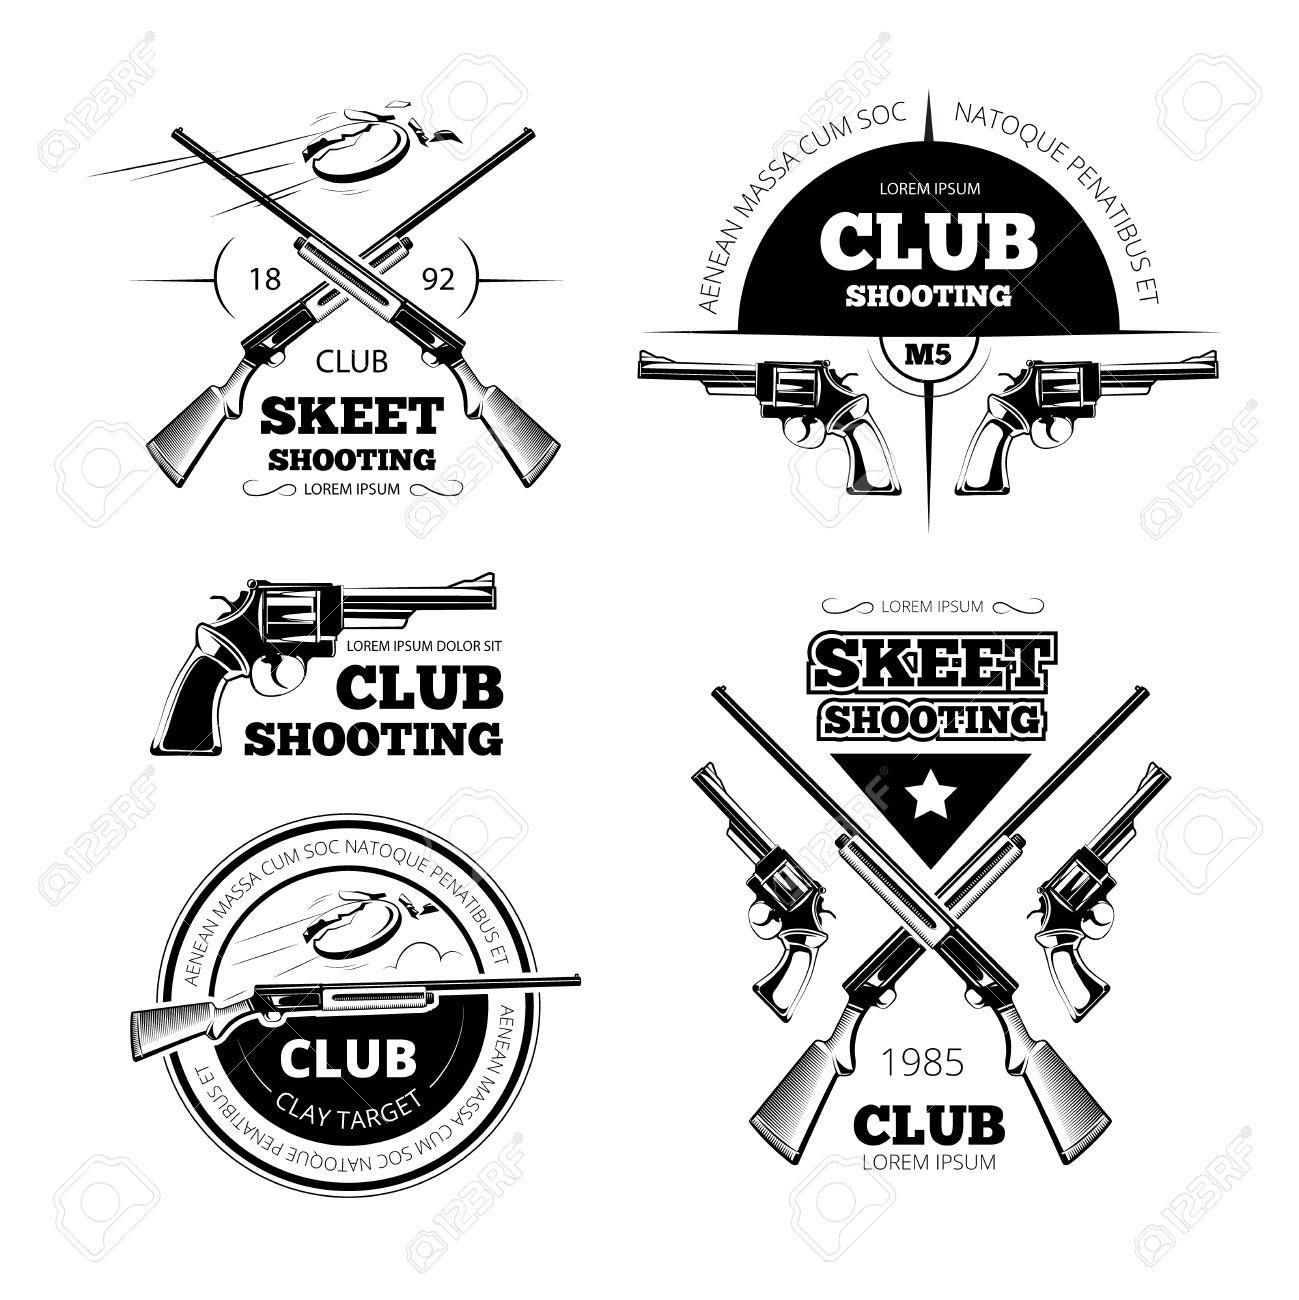 Vintage gun club labels, logos, emblems set. Badge and gun, weapon rifle, vector illustration - 51644176